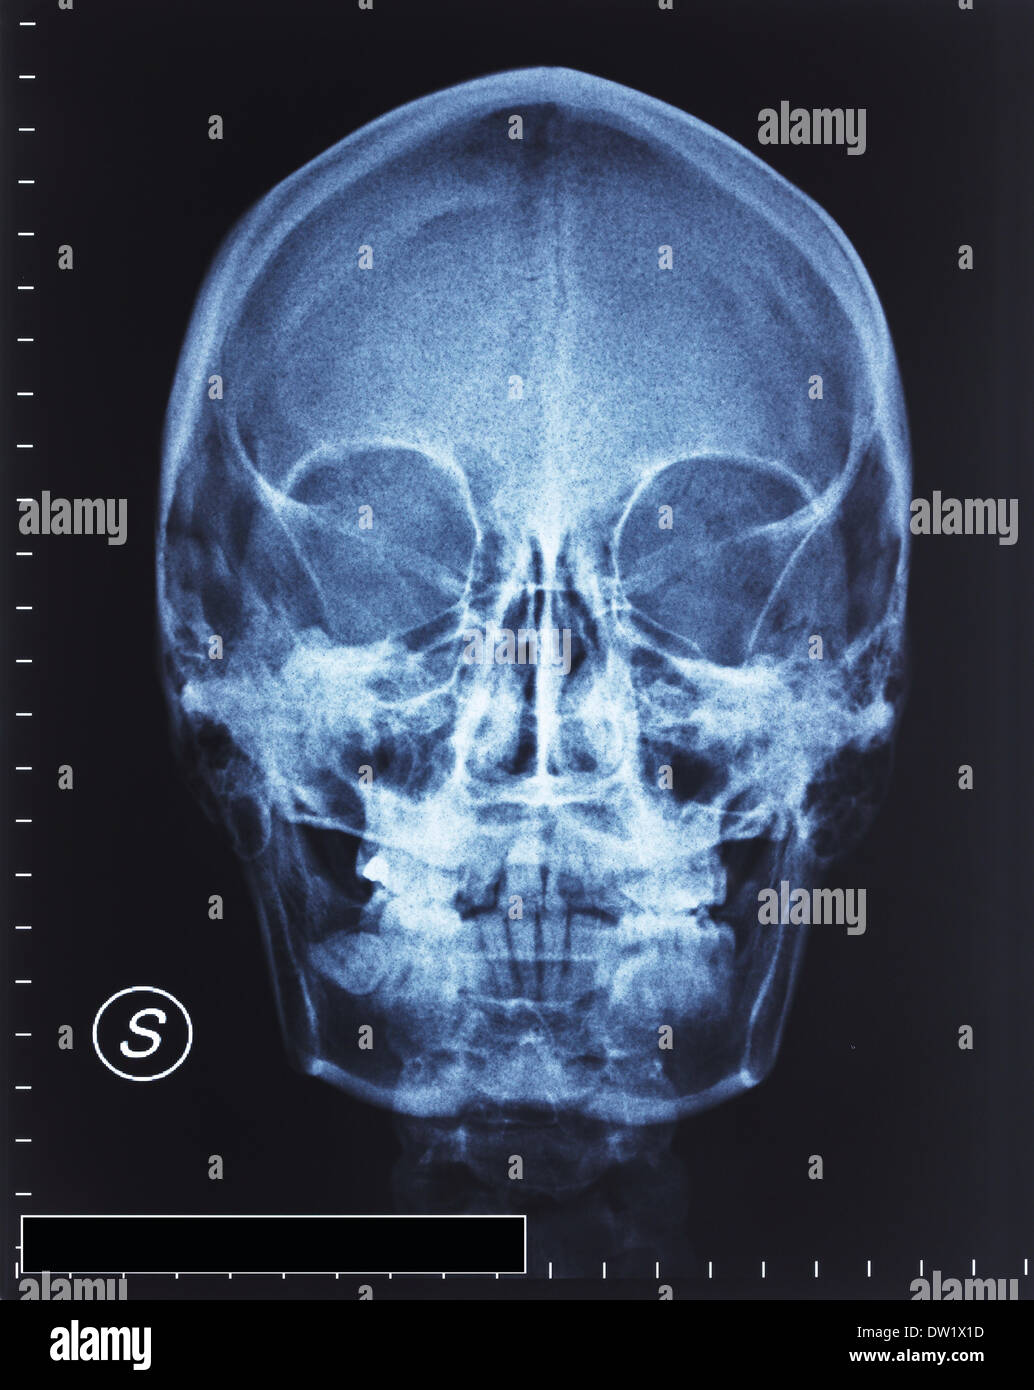 skull xray - Stock Image